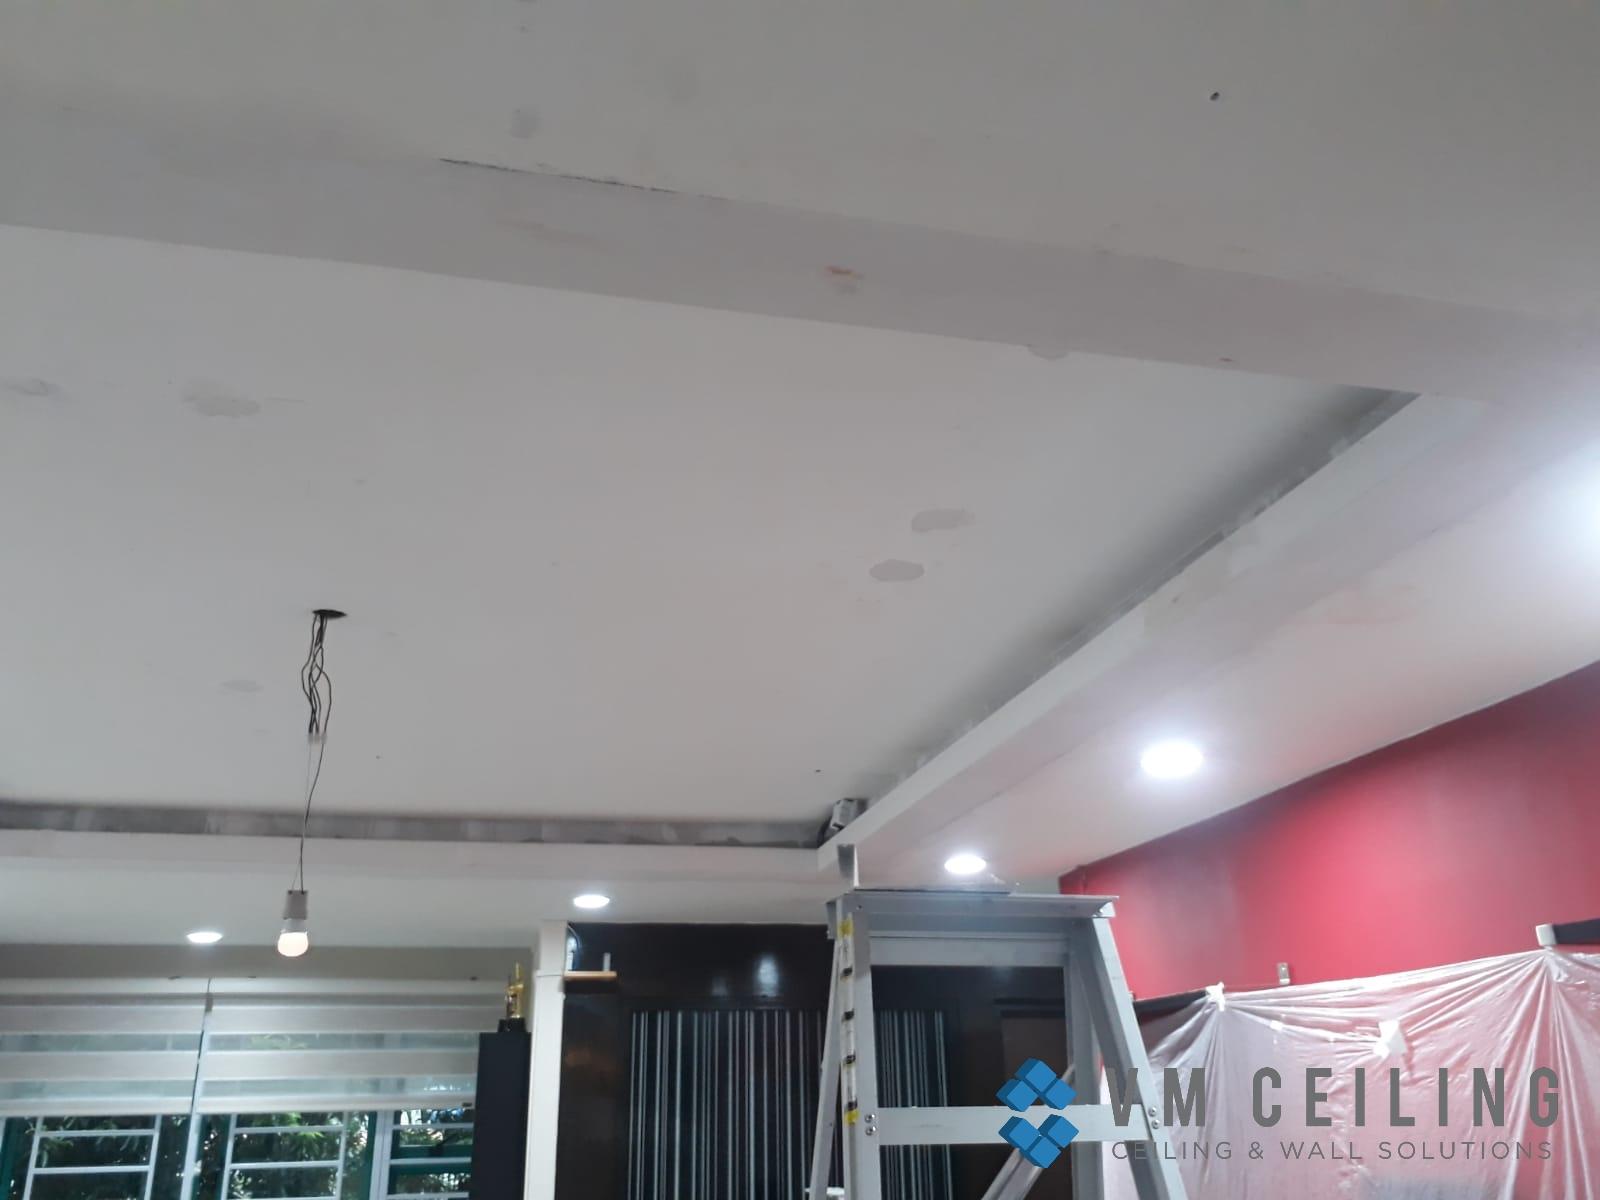 Living Room False Ceiling Downlights Installation vm ceiling Singapore HDB Admiralty 1